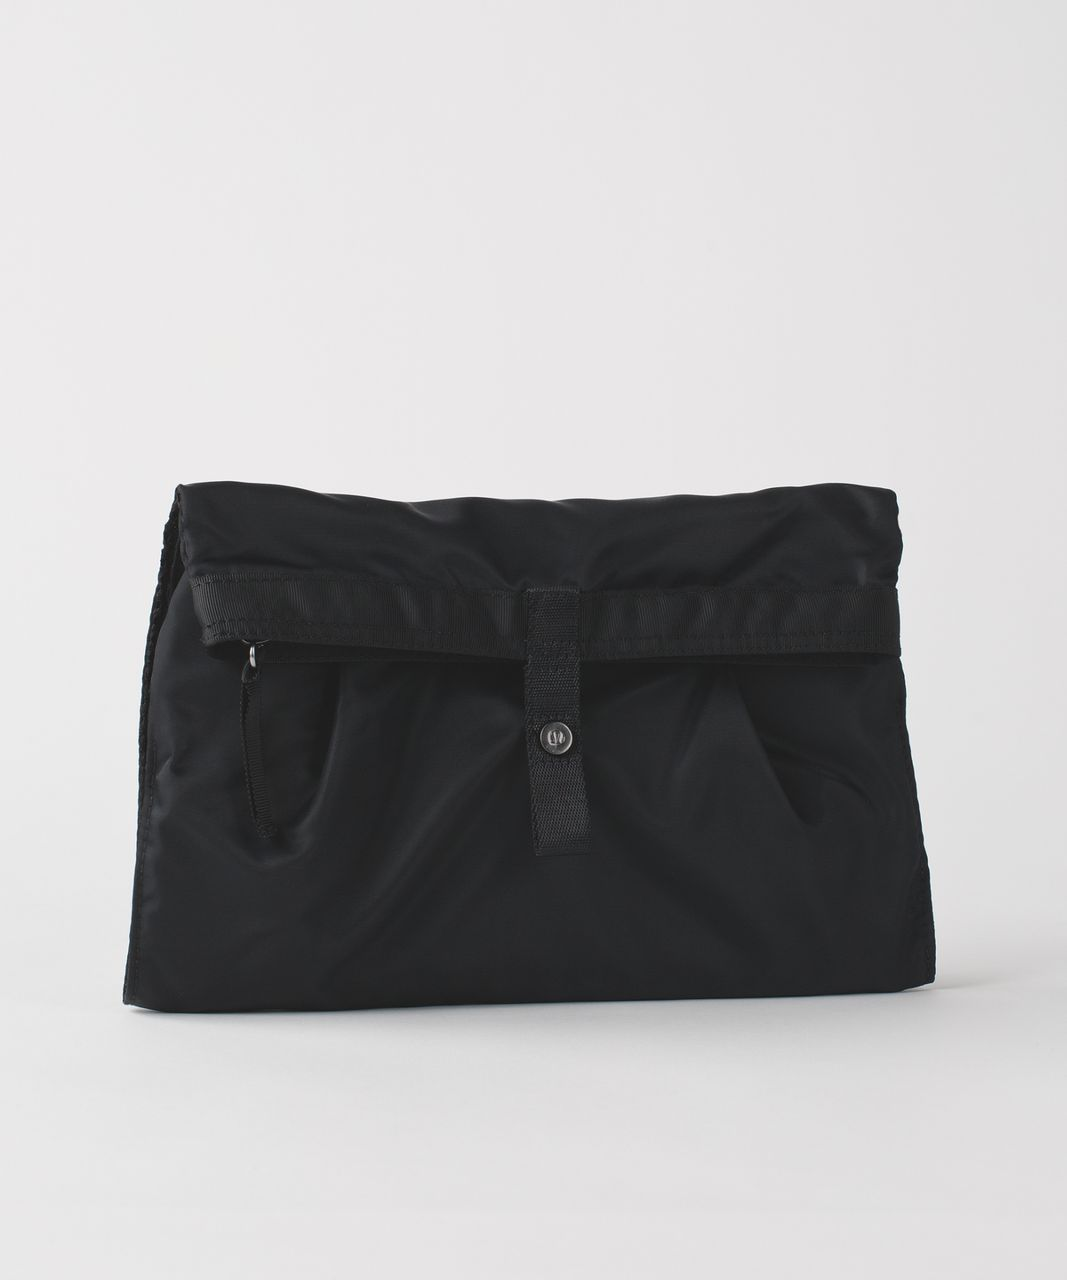 Lululemon Sweaty Or Not Kit - Black